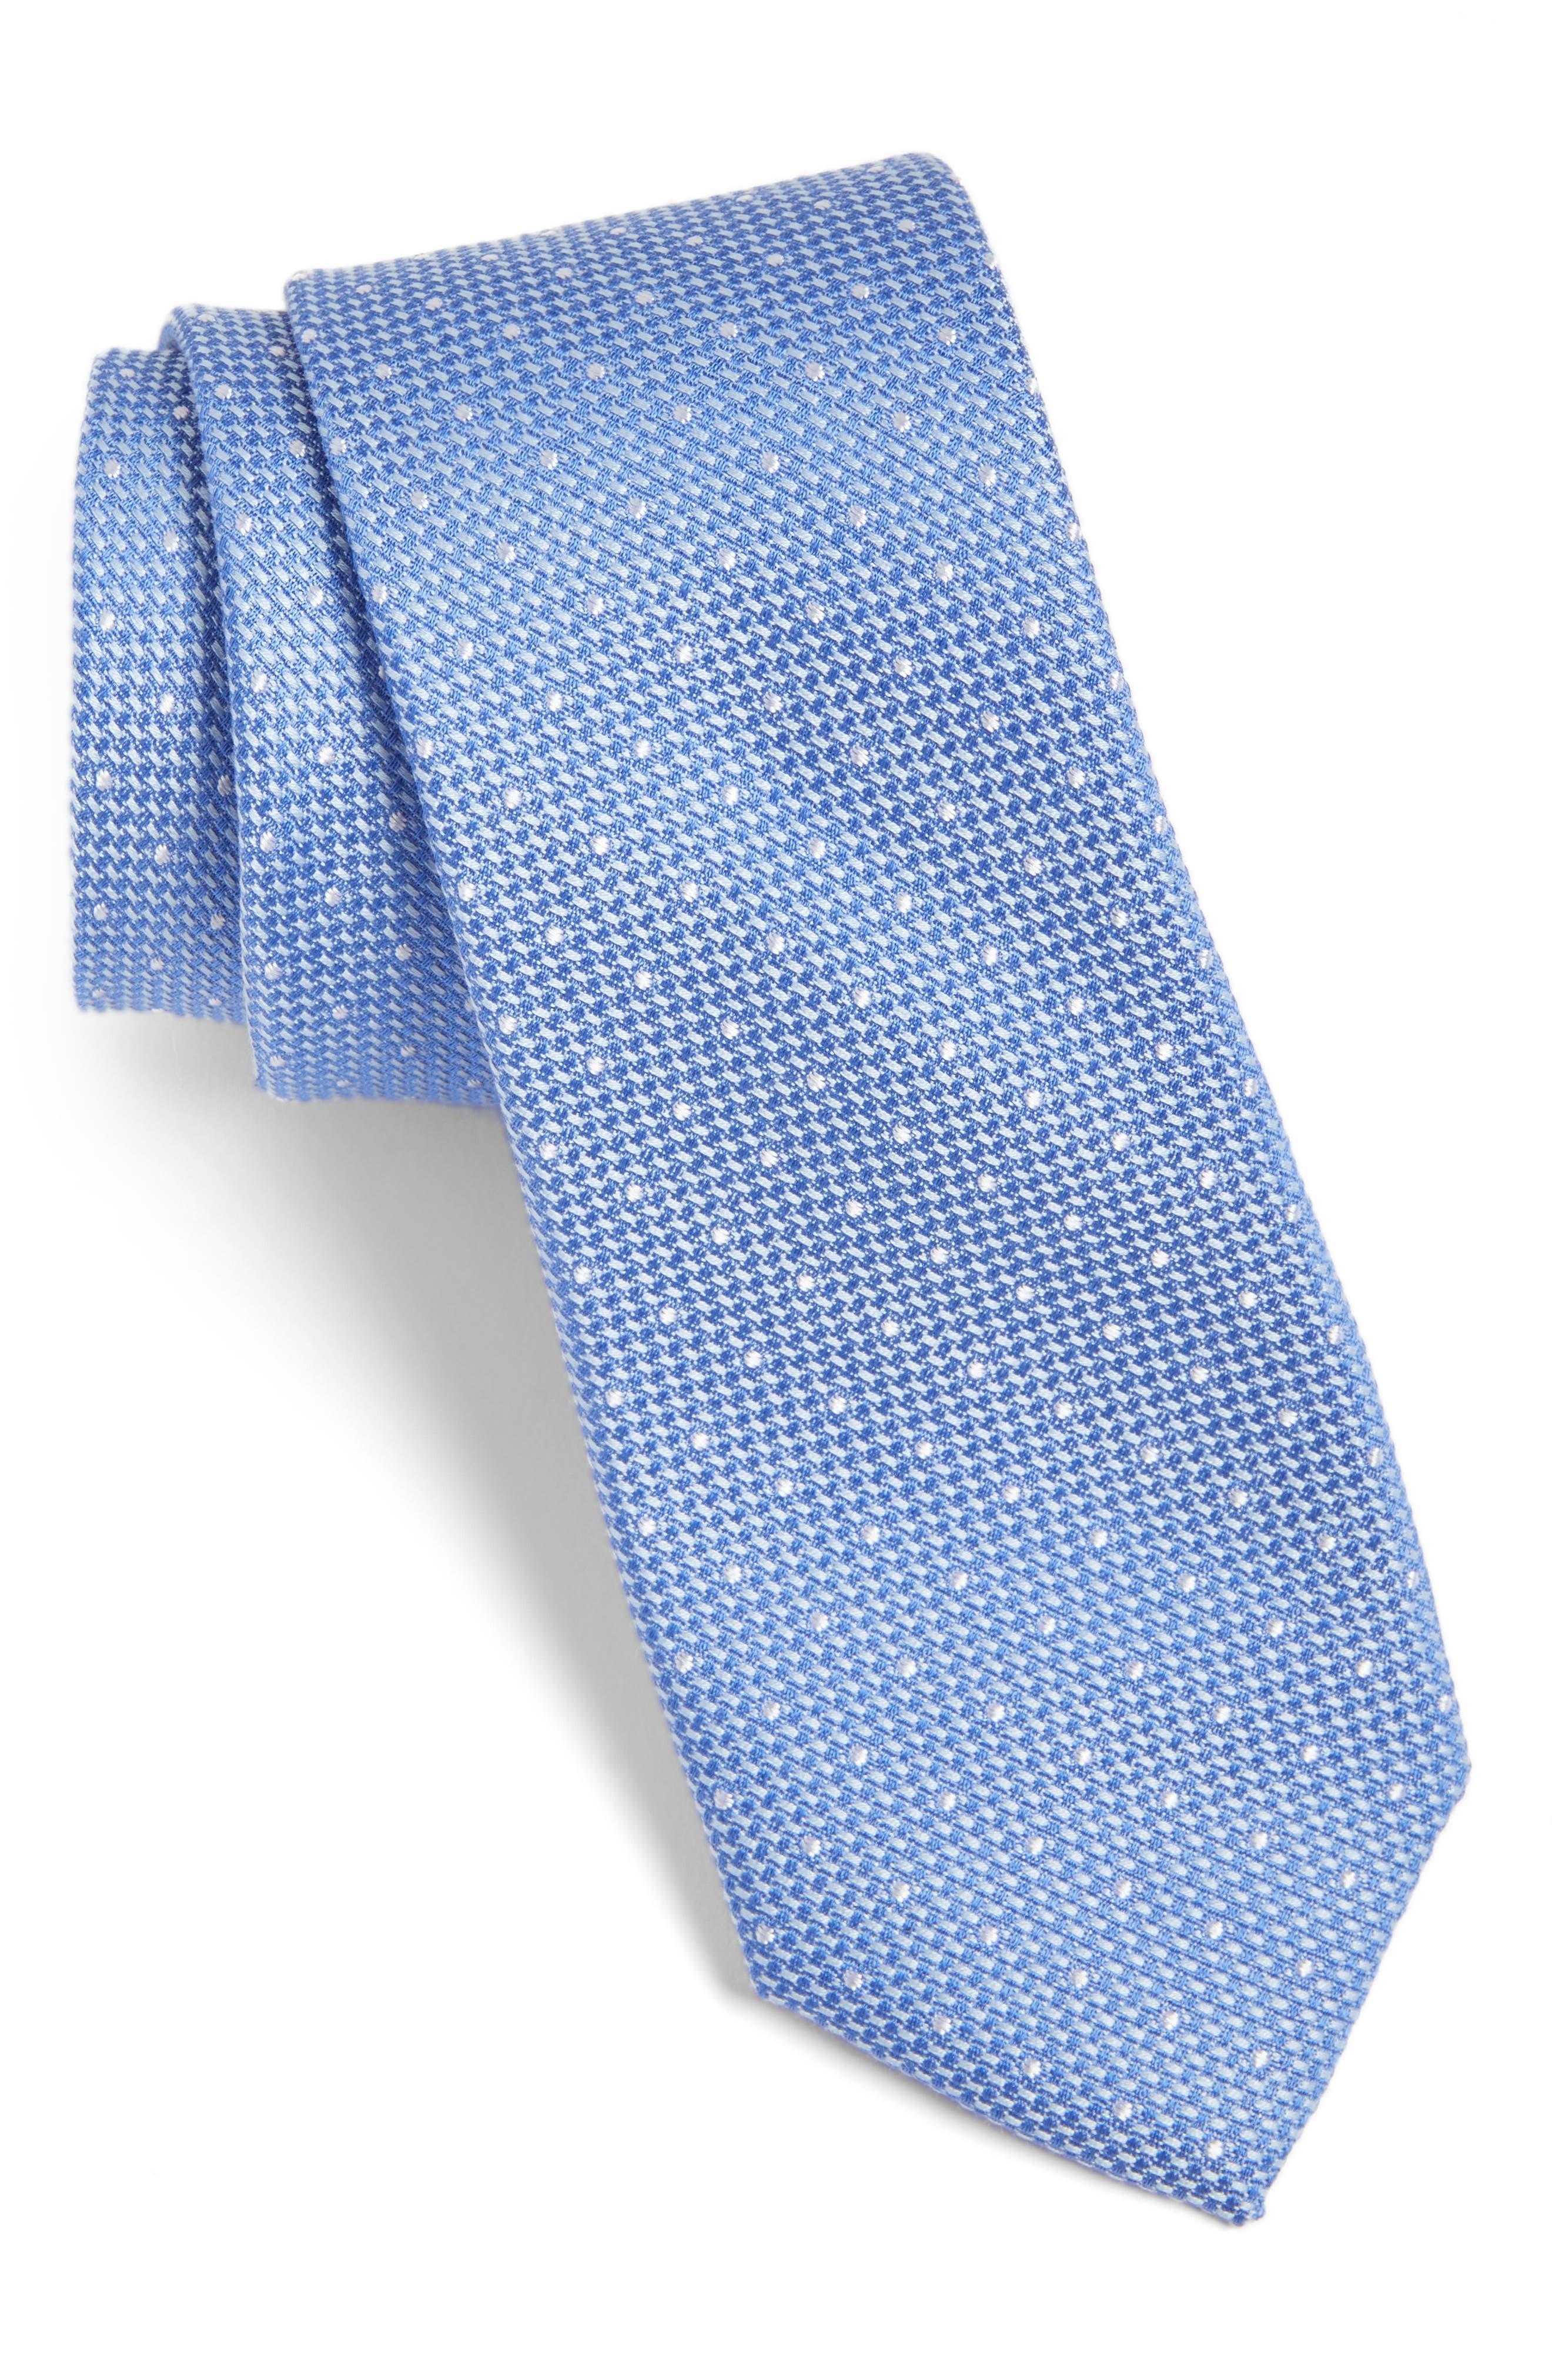 Alternate Image 1 Selected - Calibrate Dot Cotton & Silk Tie